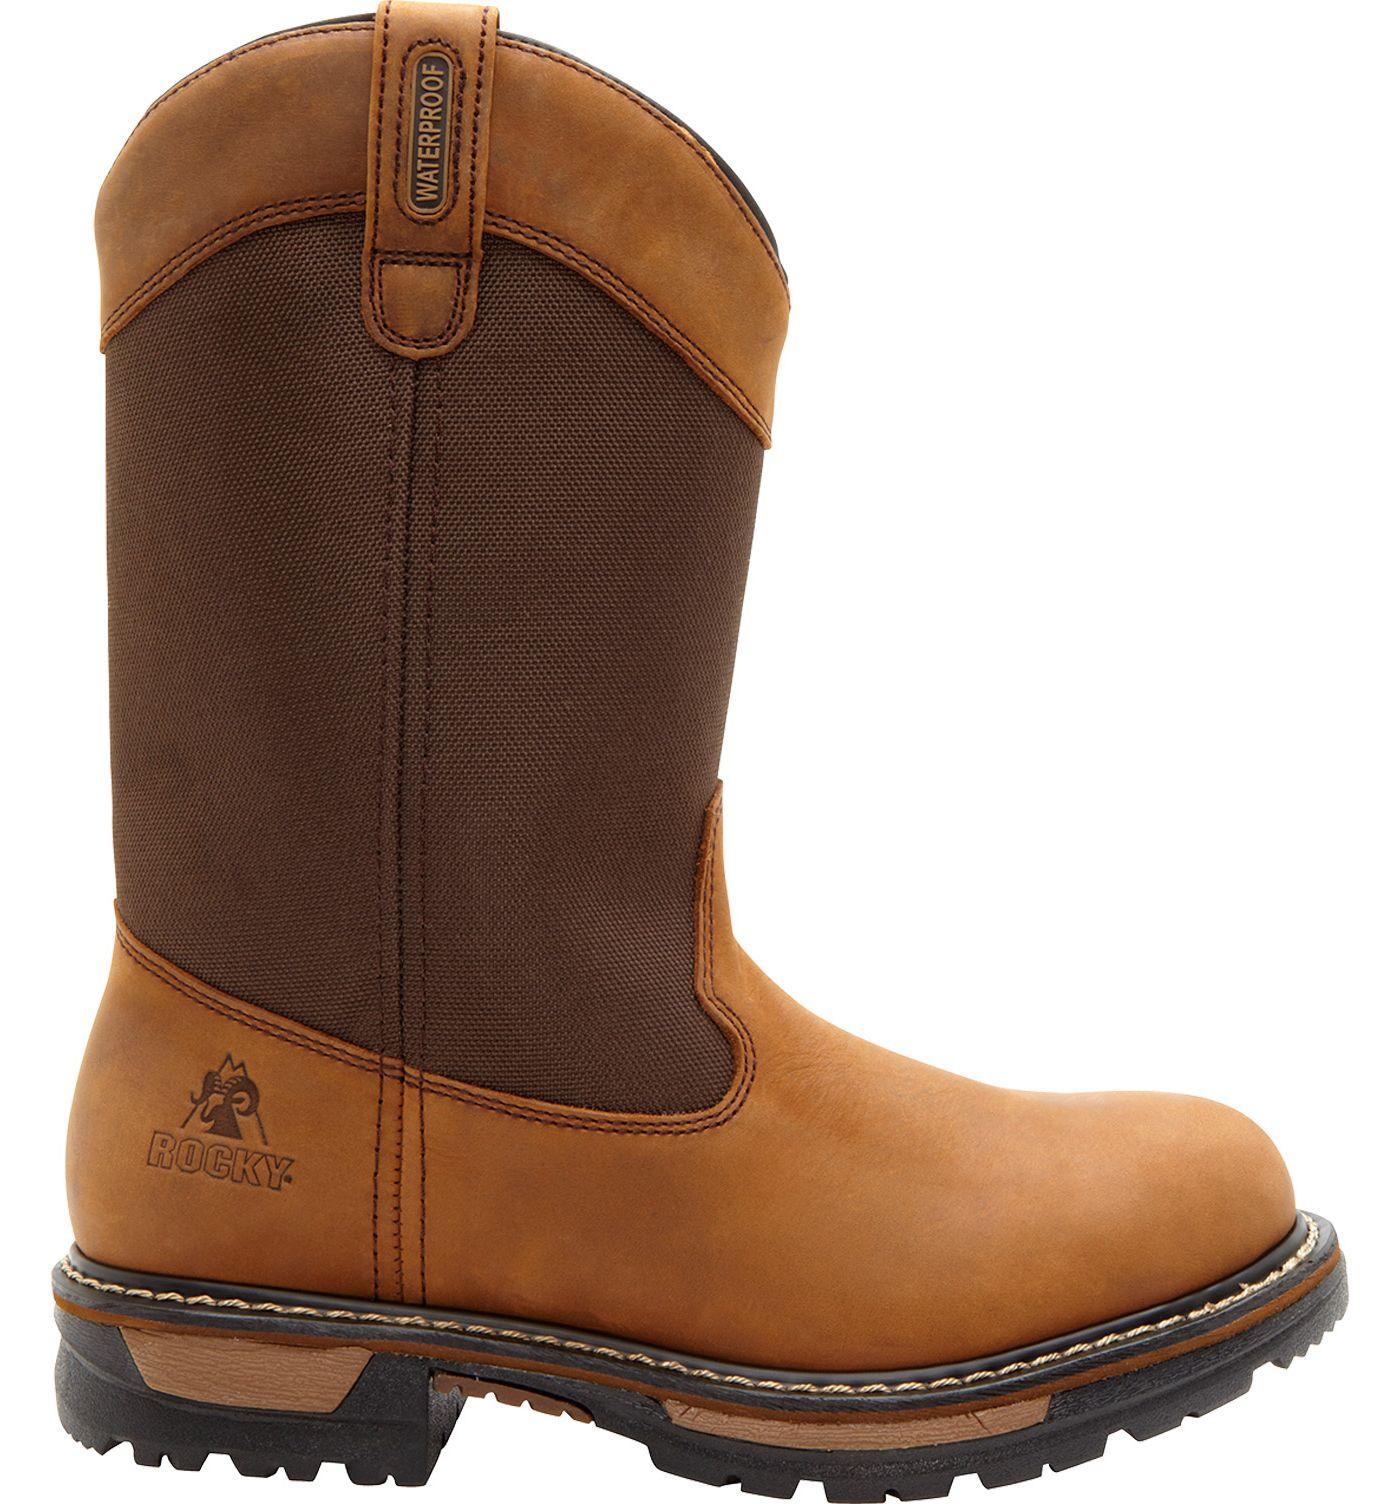 Rocky Men's Ride Waterproof 200g Wellington Work Boots